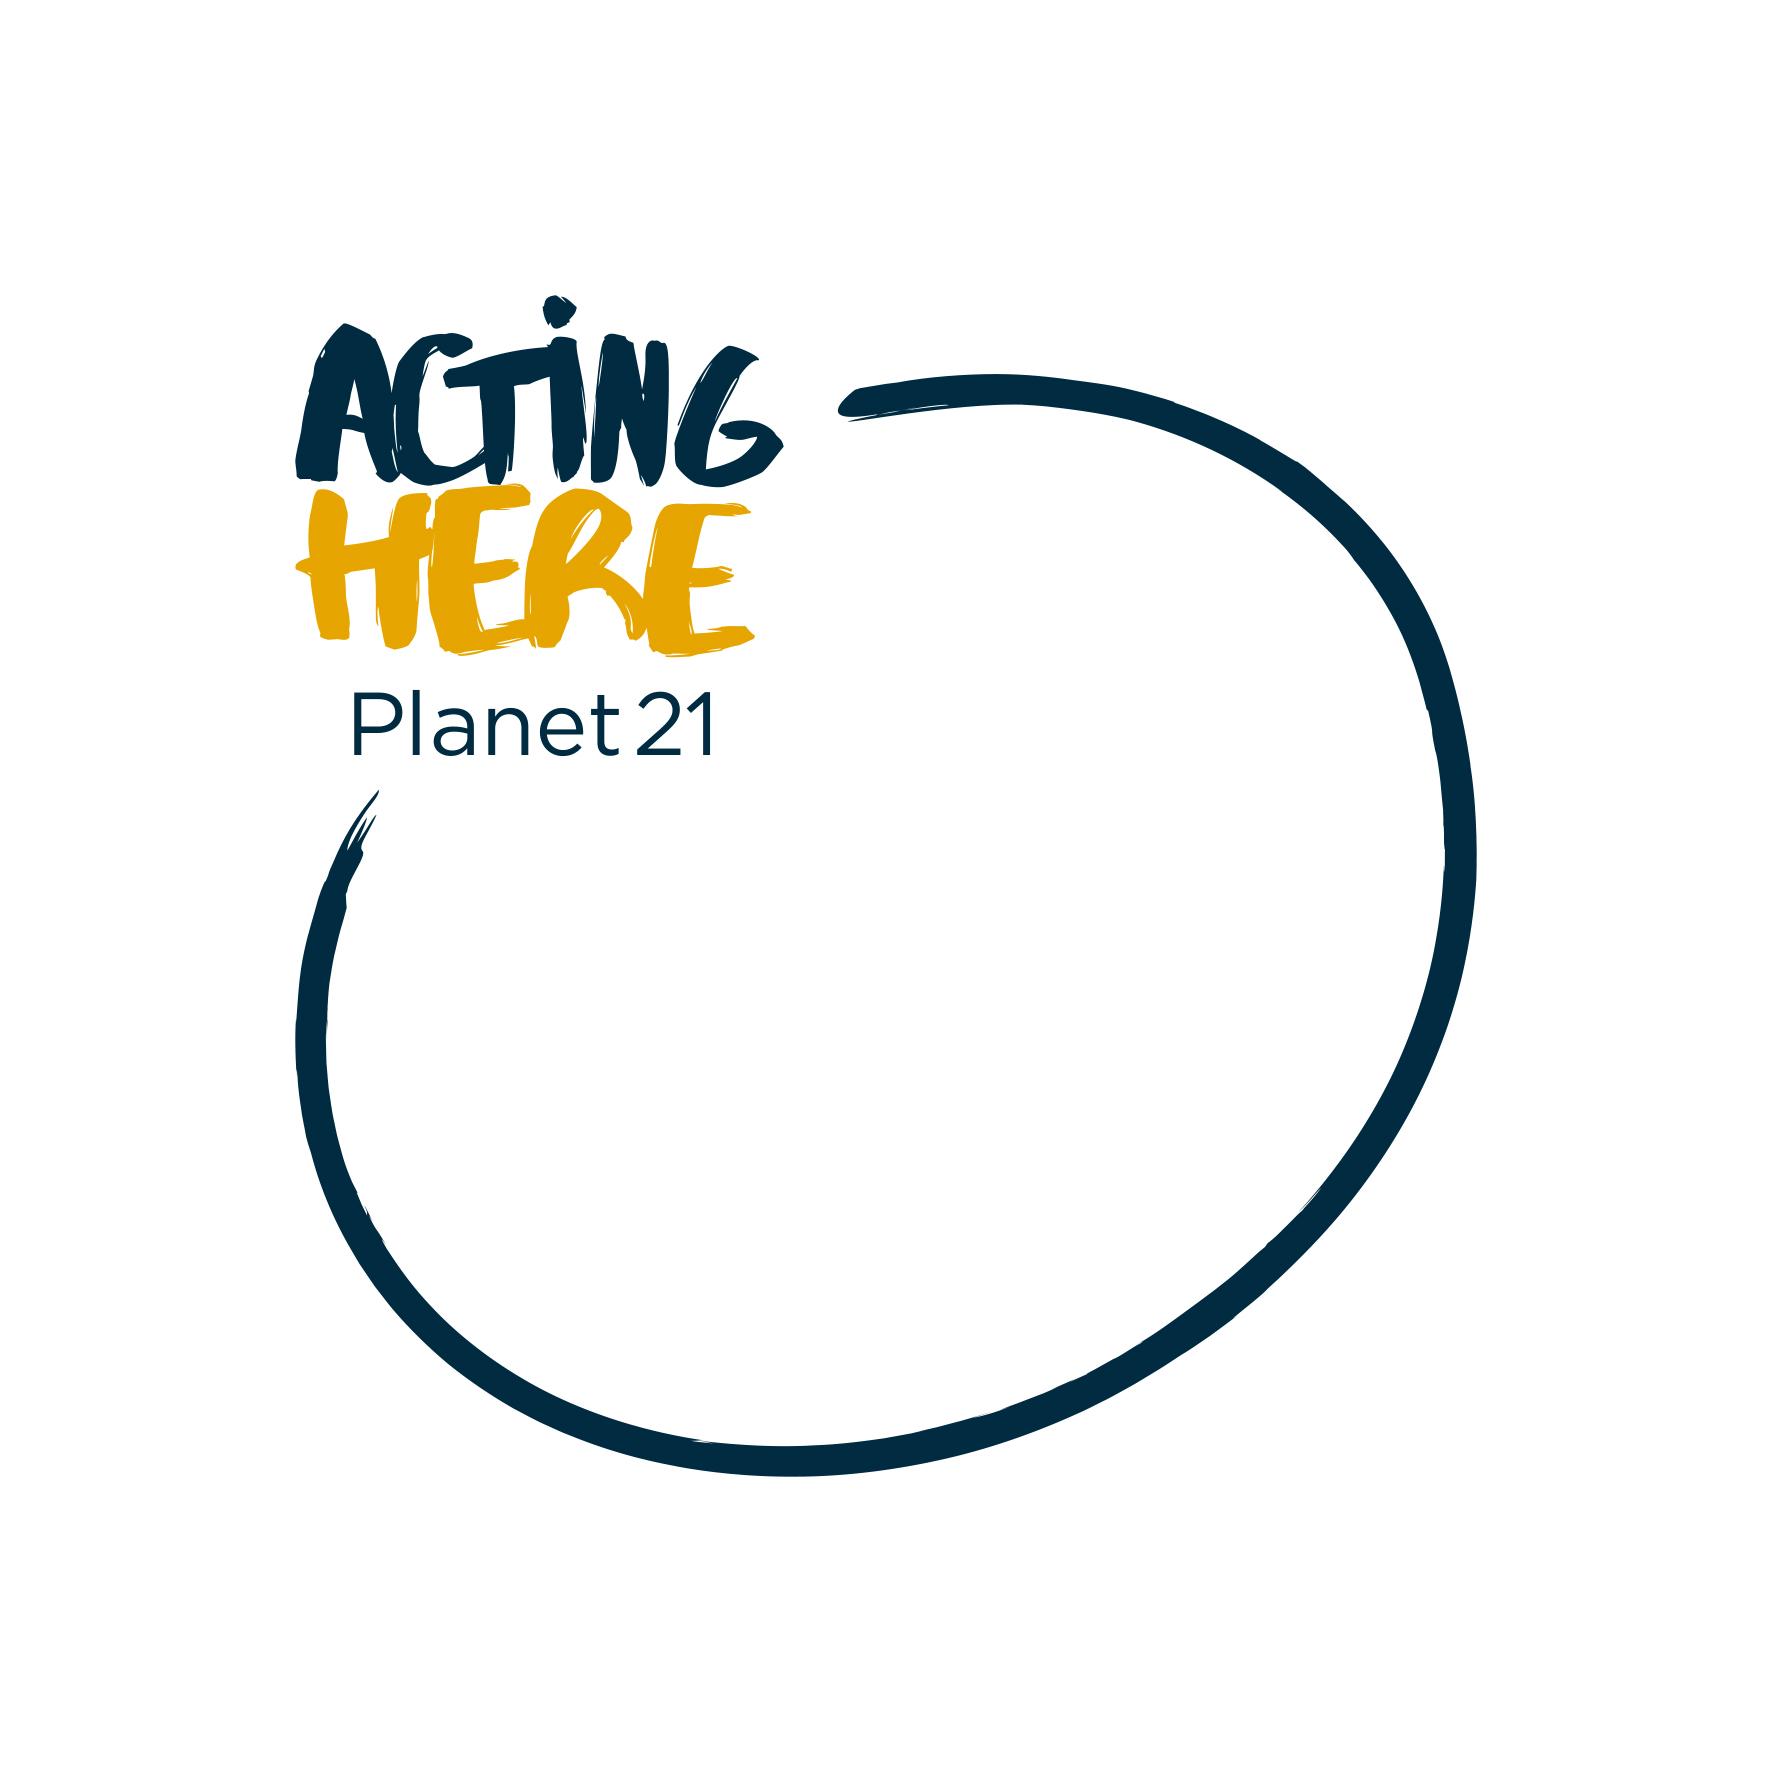 acting_here_2 logo